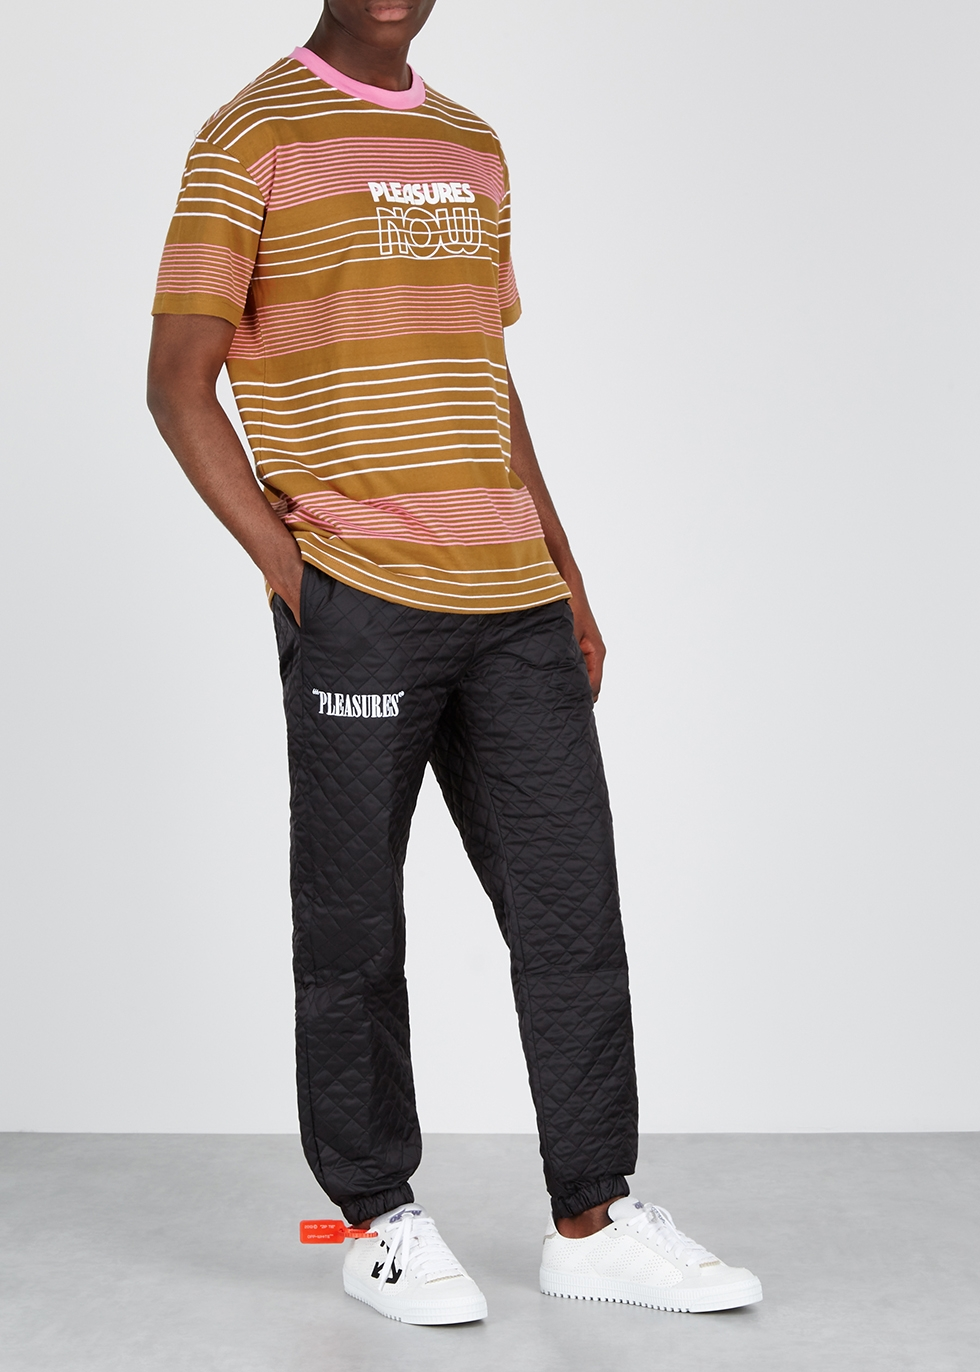 Feedback striped cotton T-shirt - Pleasures